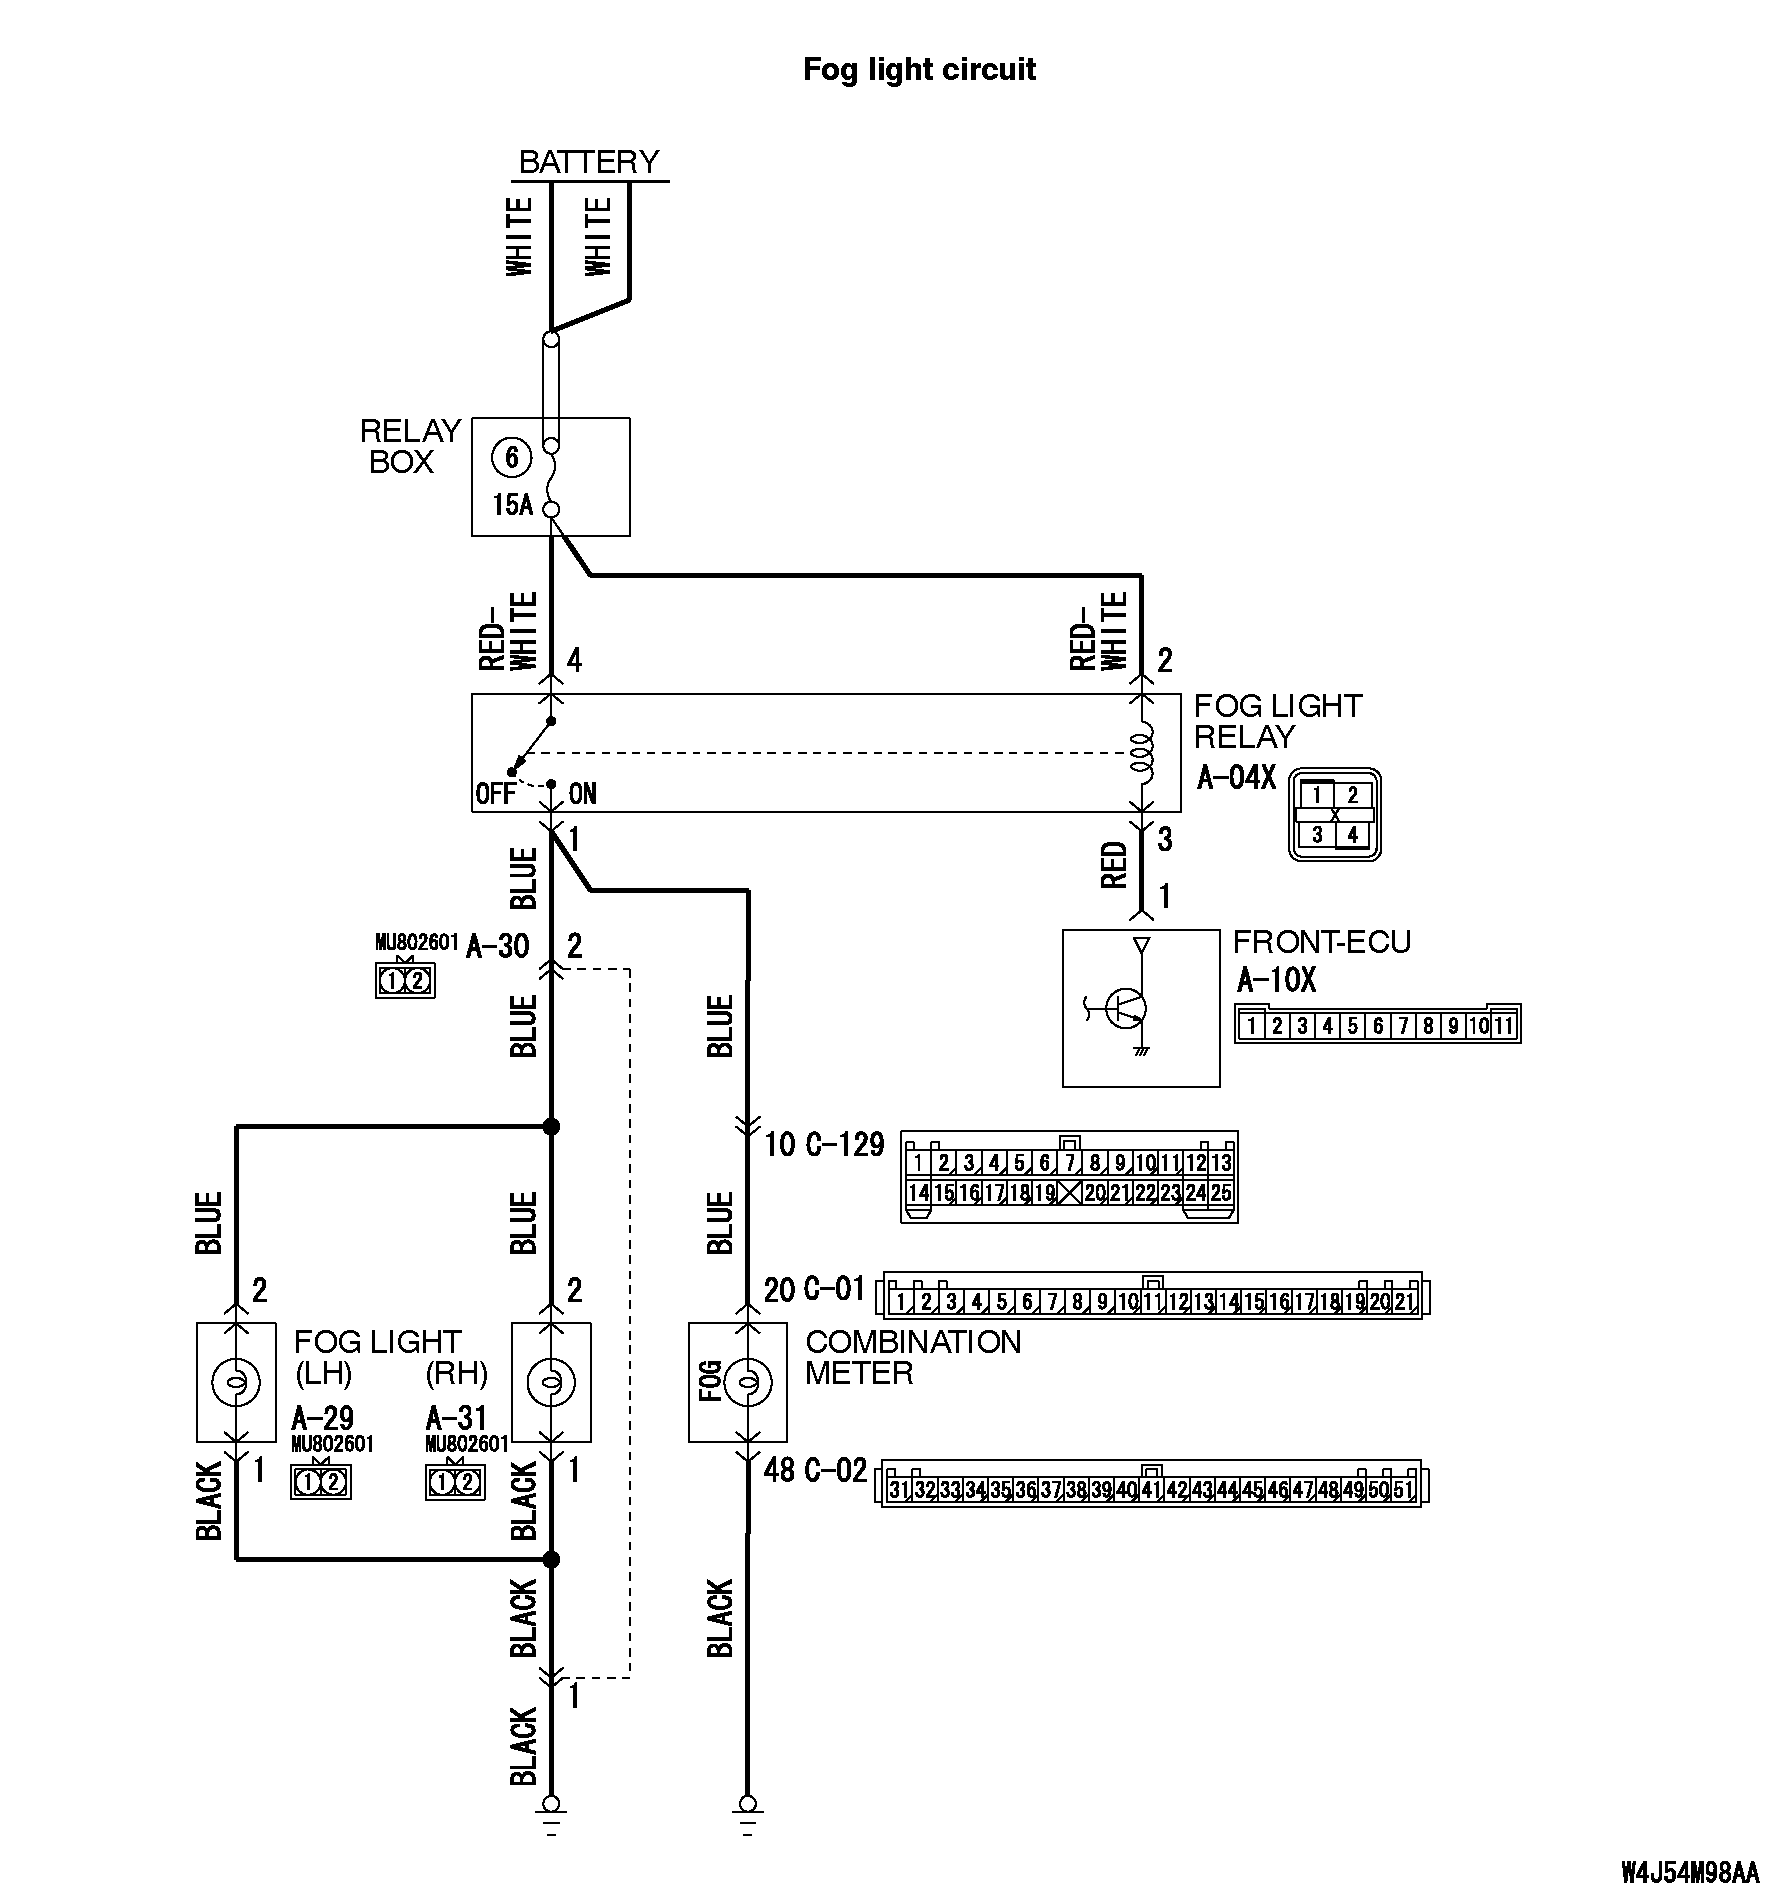 2011 Mitsubishi Lancer Wiring Diagram Simple 2001 Eclipse Spyder 26 Images